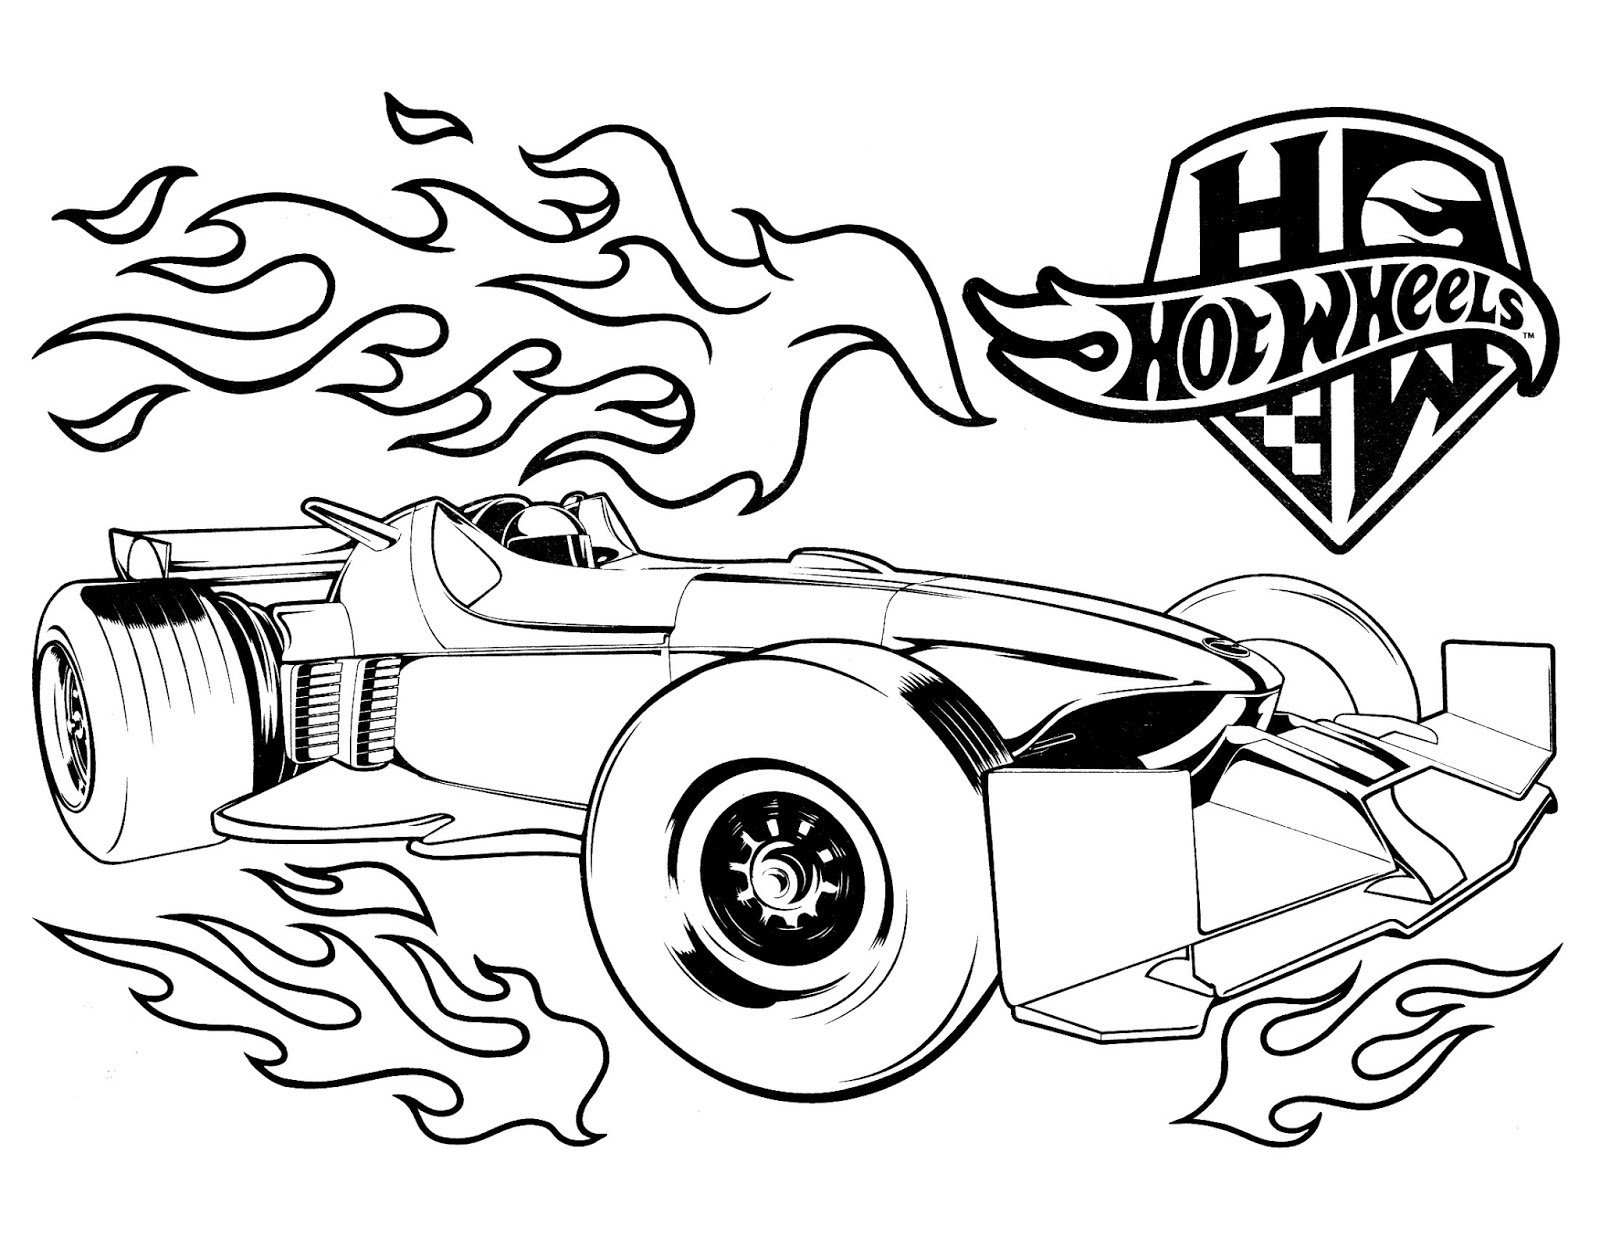 Desenhos Para Colorir Da Hot Wheels